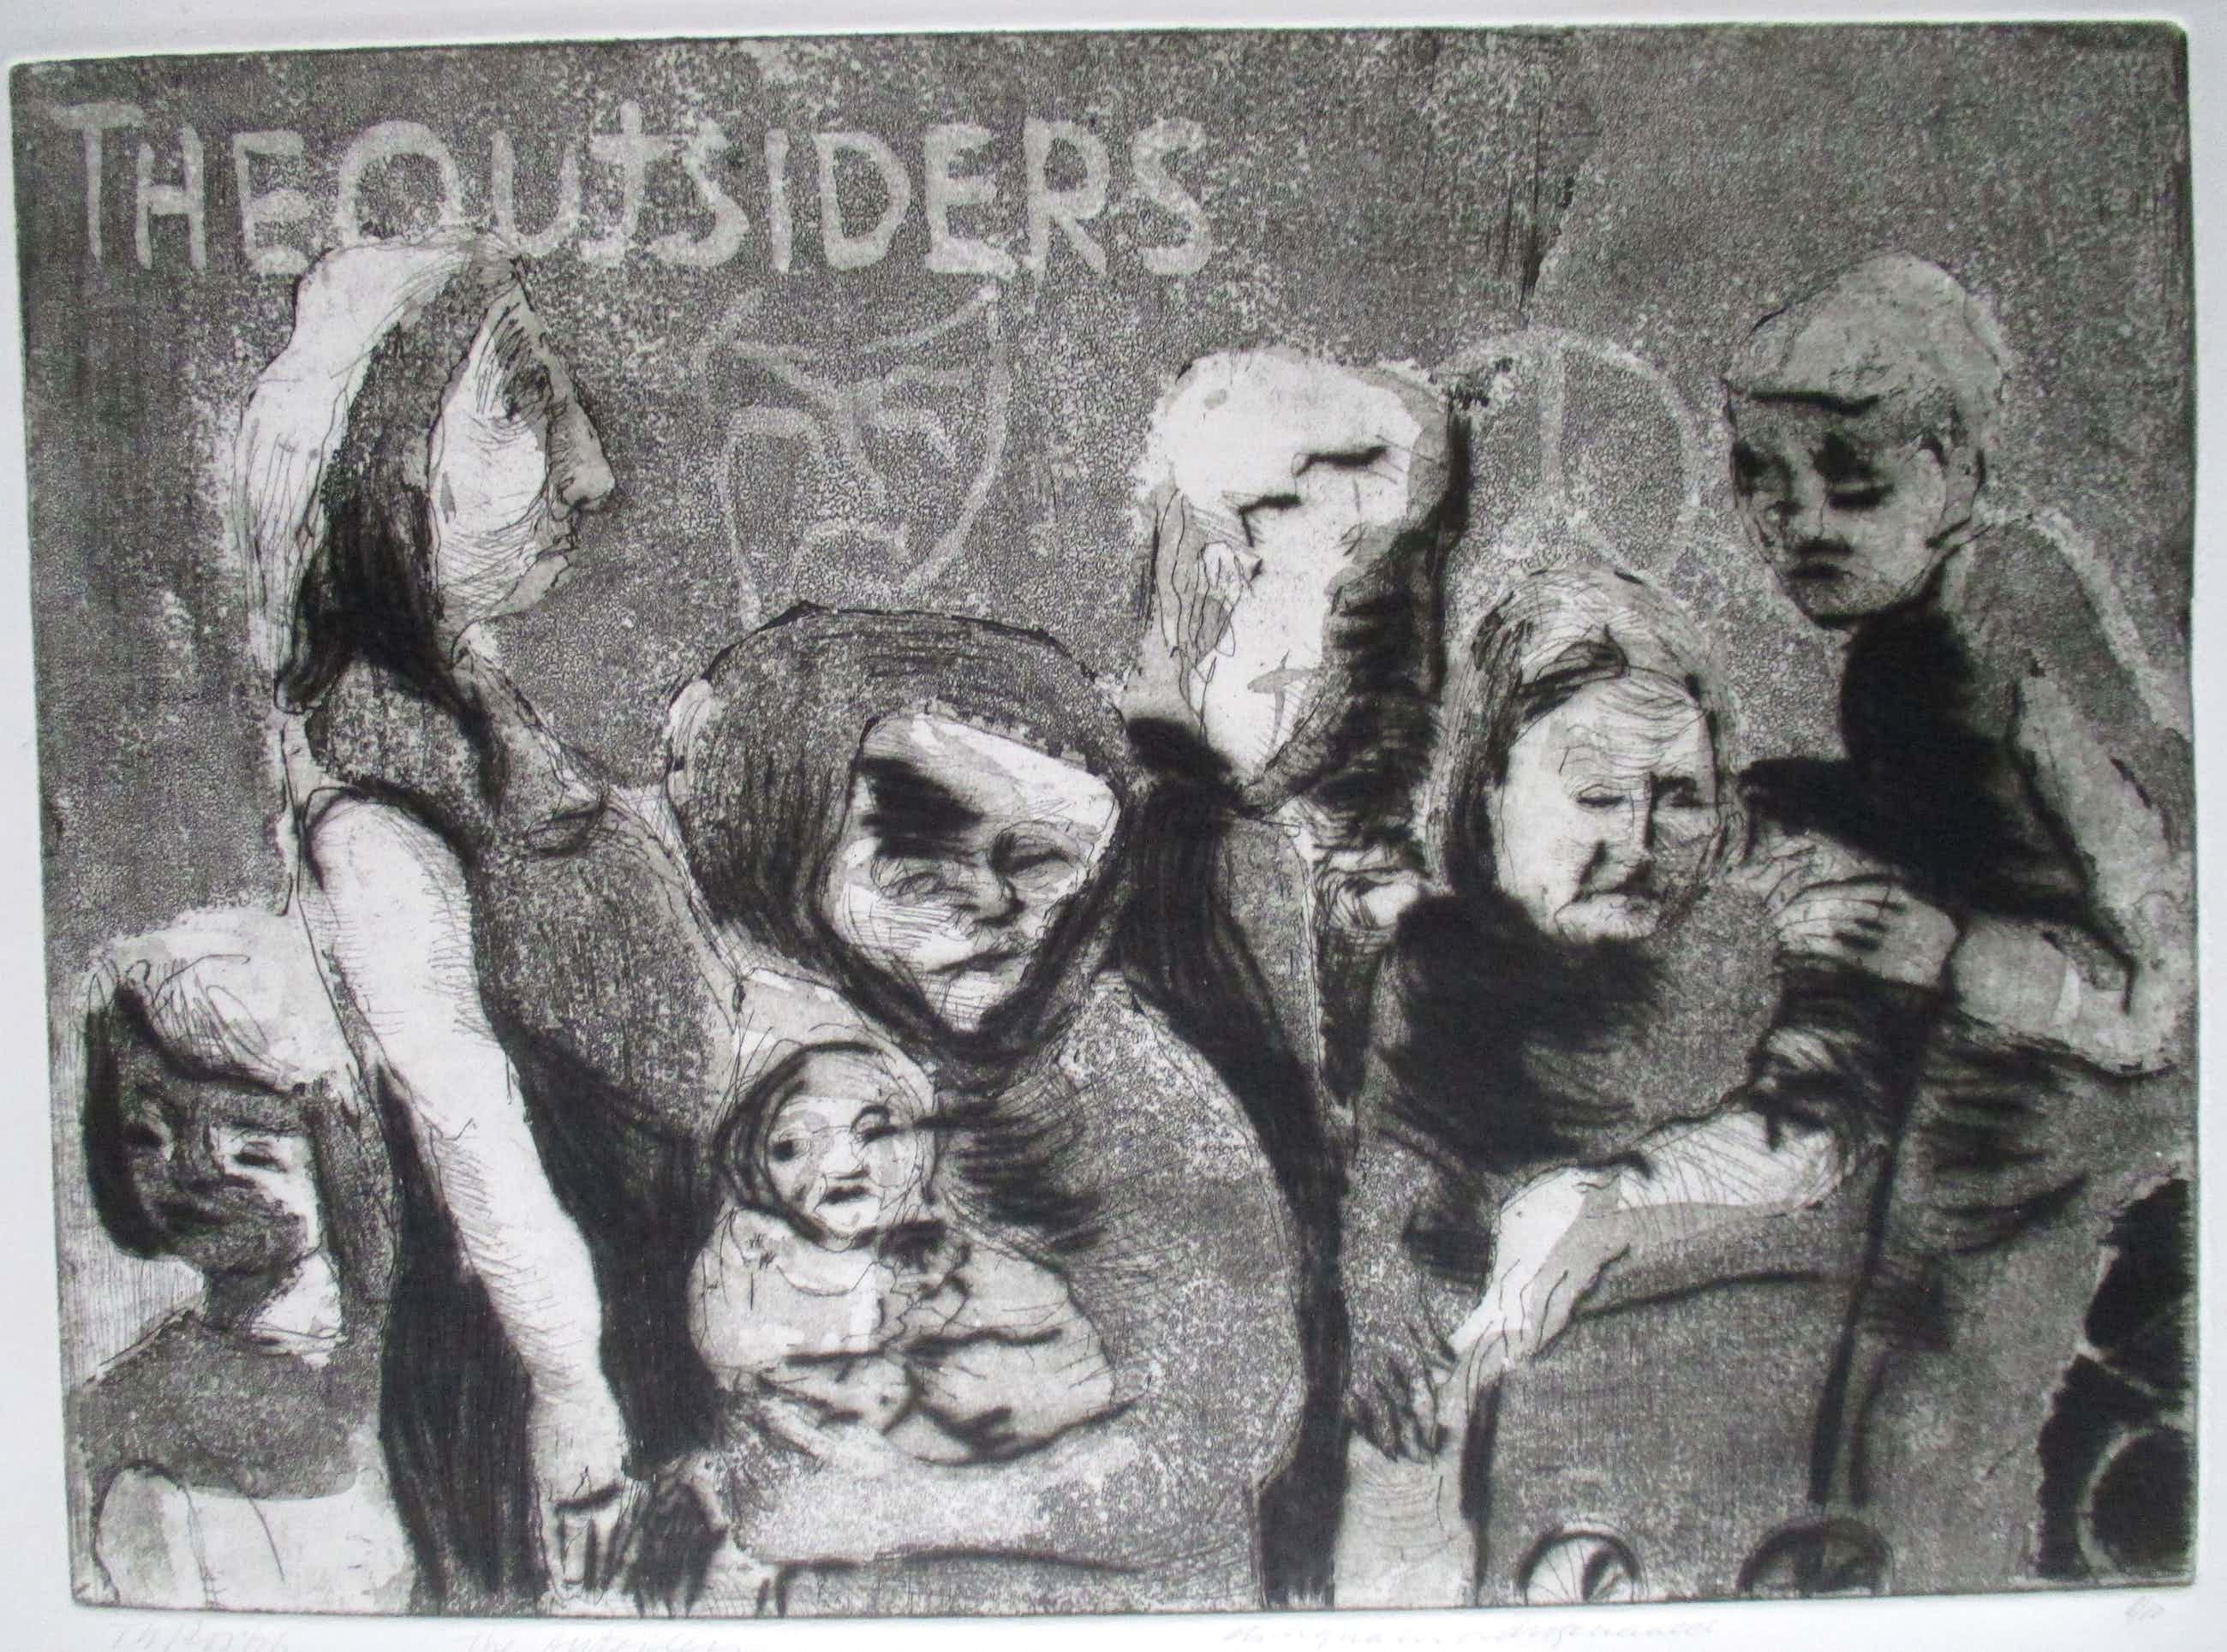 Theo Ros - Ets The Outsiders kleine oplage kopen? Bied vanaf 30!